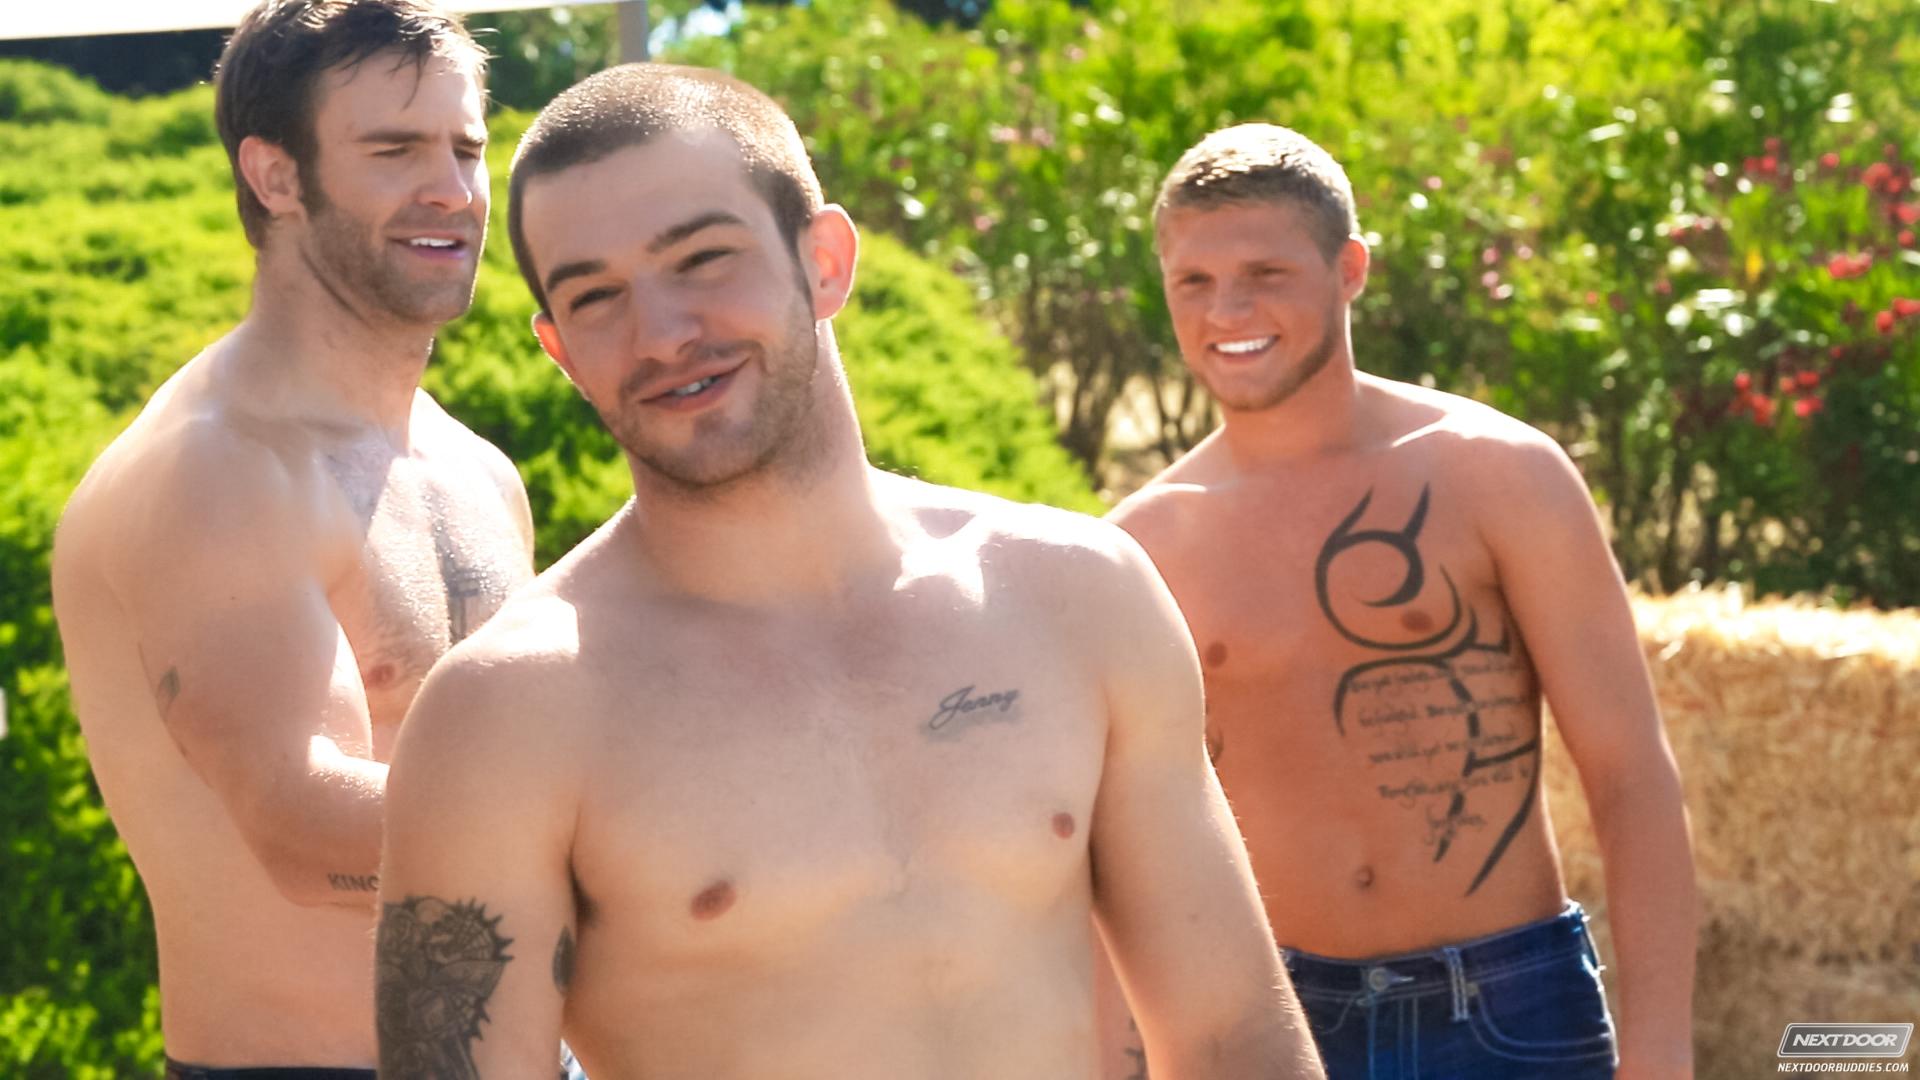 Liam Magnuson fuck Christian Cayden gay hot daddy dude men porn Gimme Five